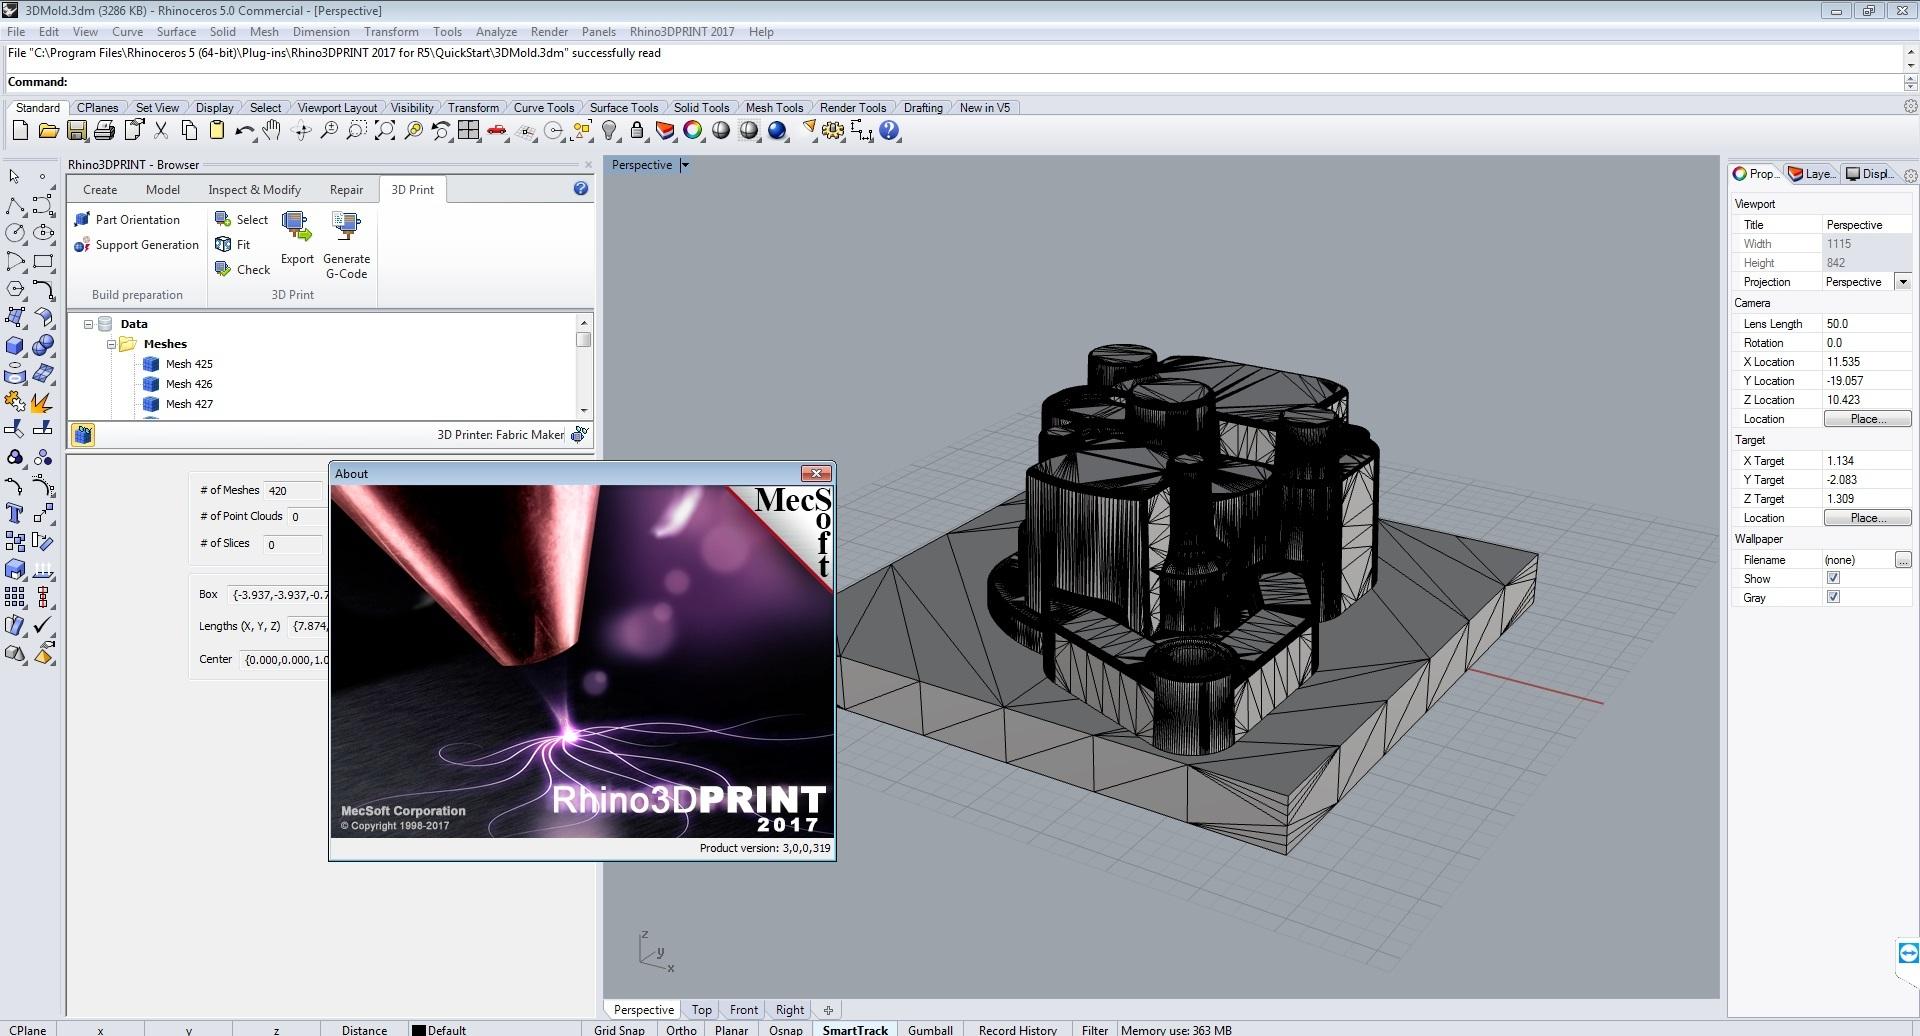 working with MecSoft Rhino3DPrint 2017 v3.0.319 for Rhino5 Win64